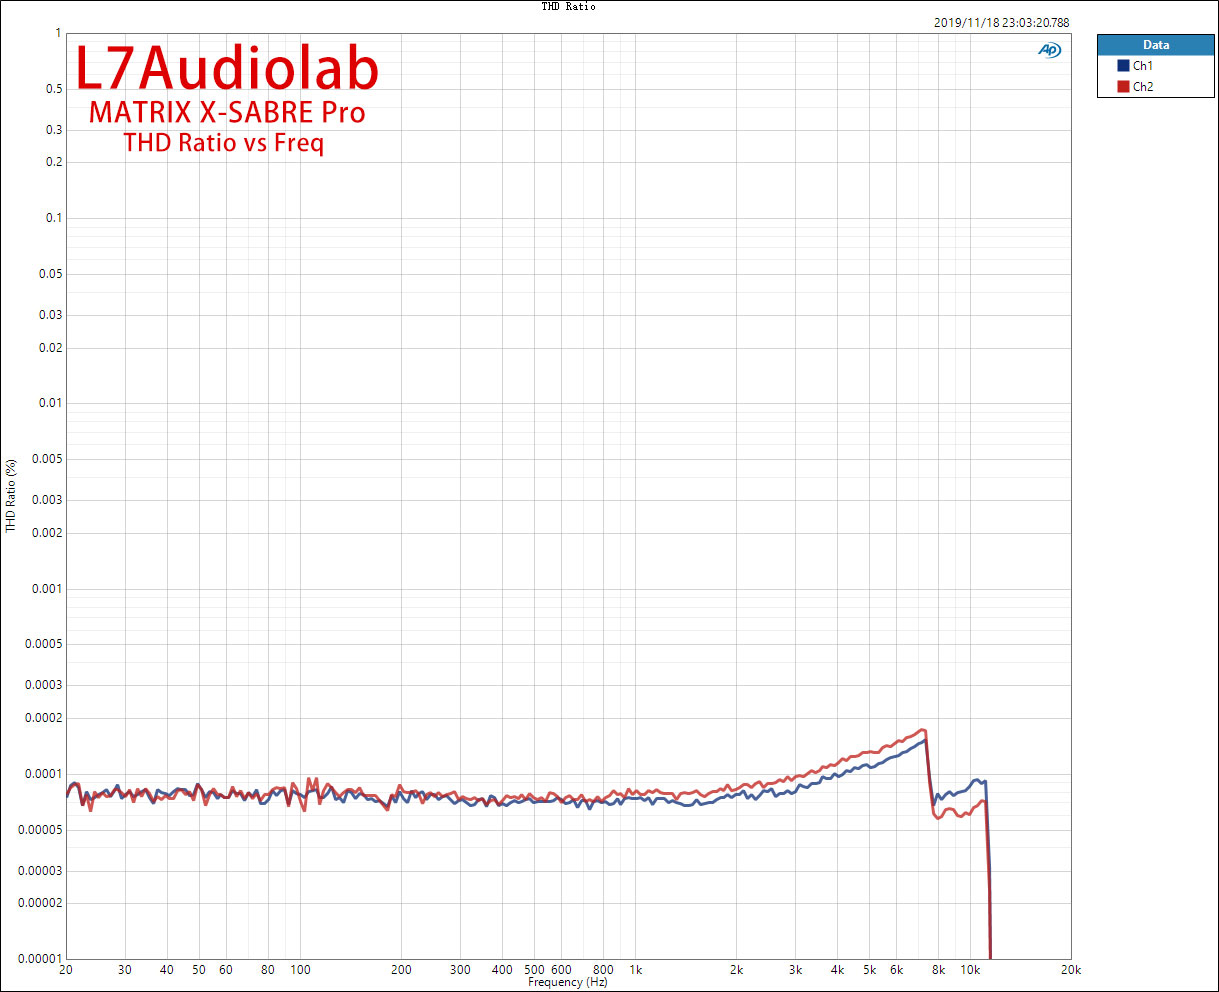 THD-Ratio.jpg